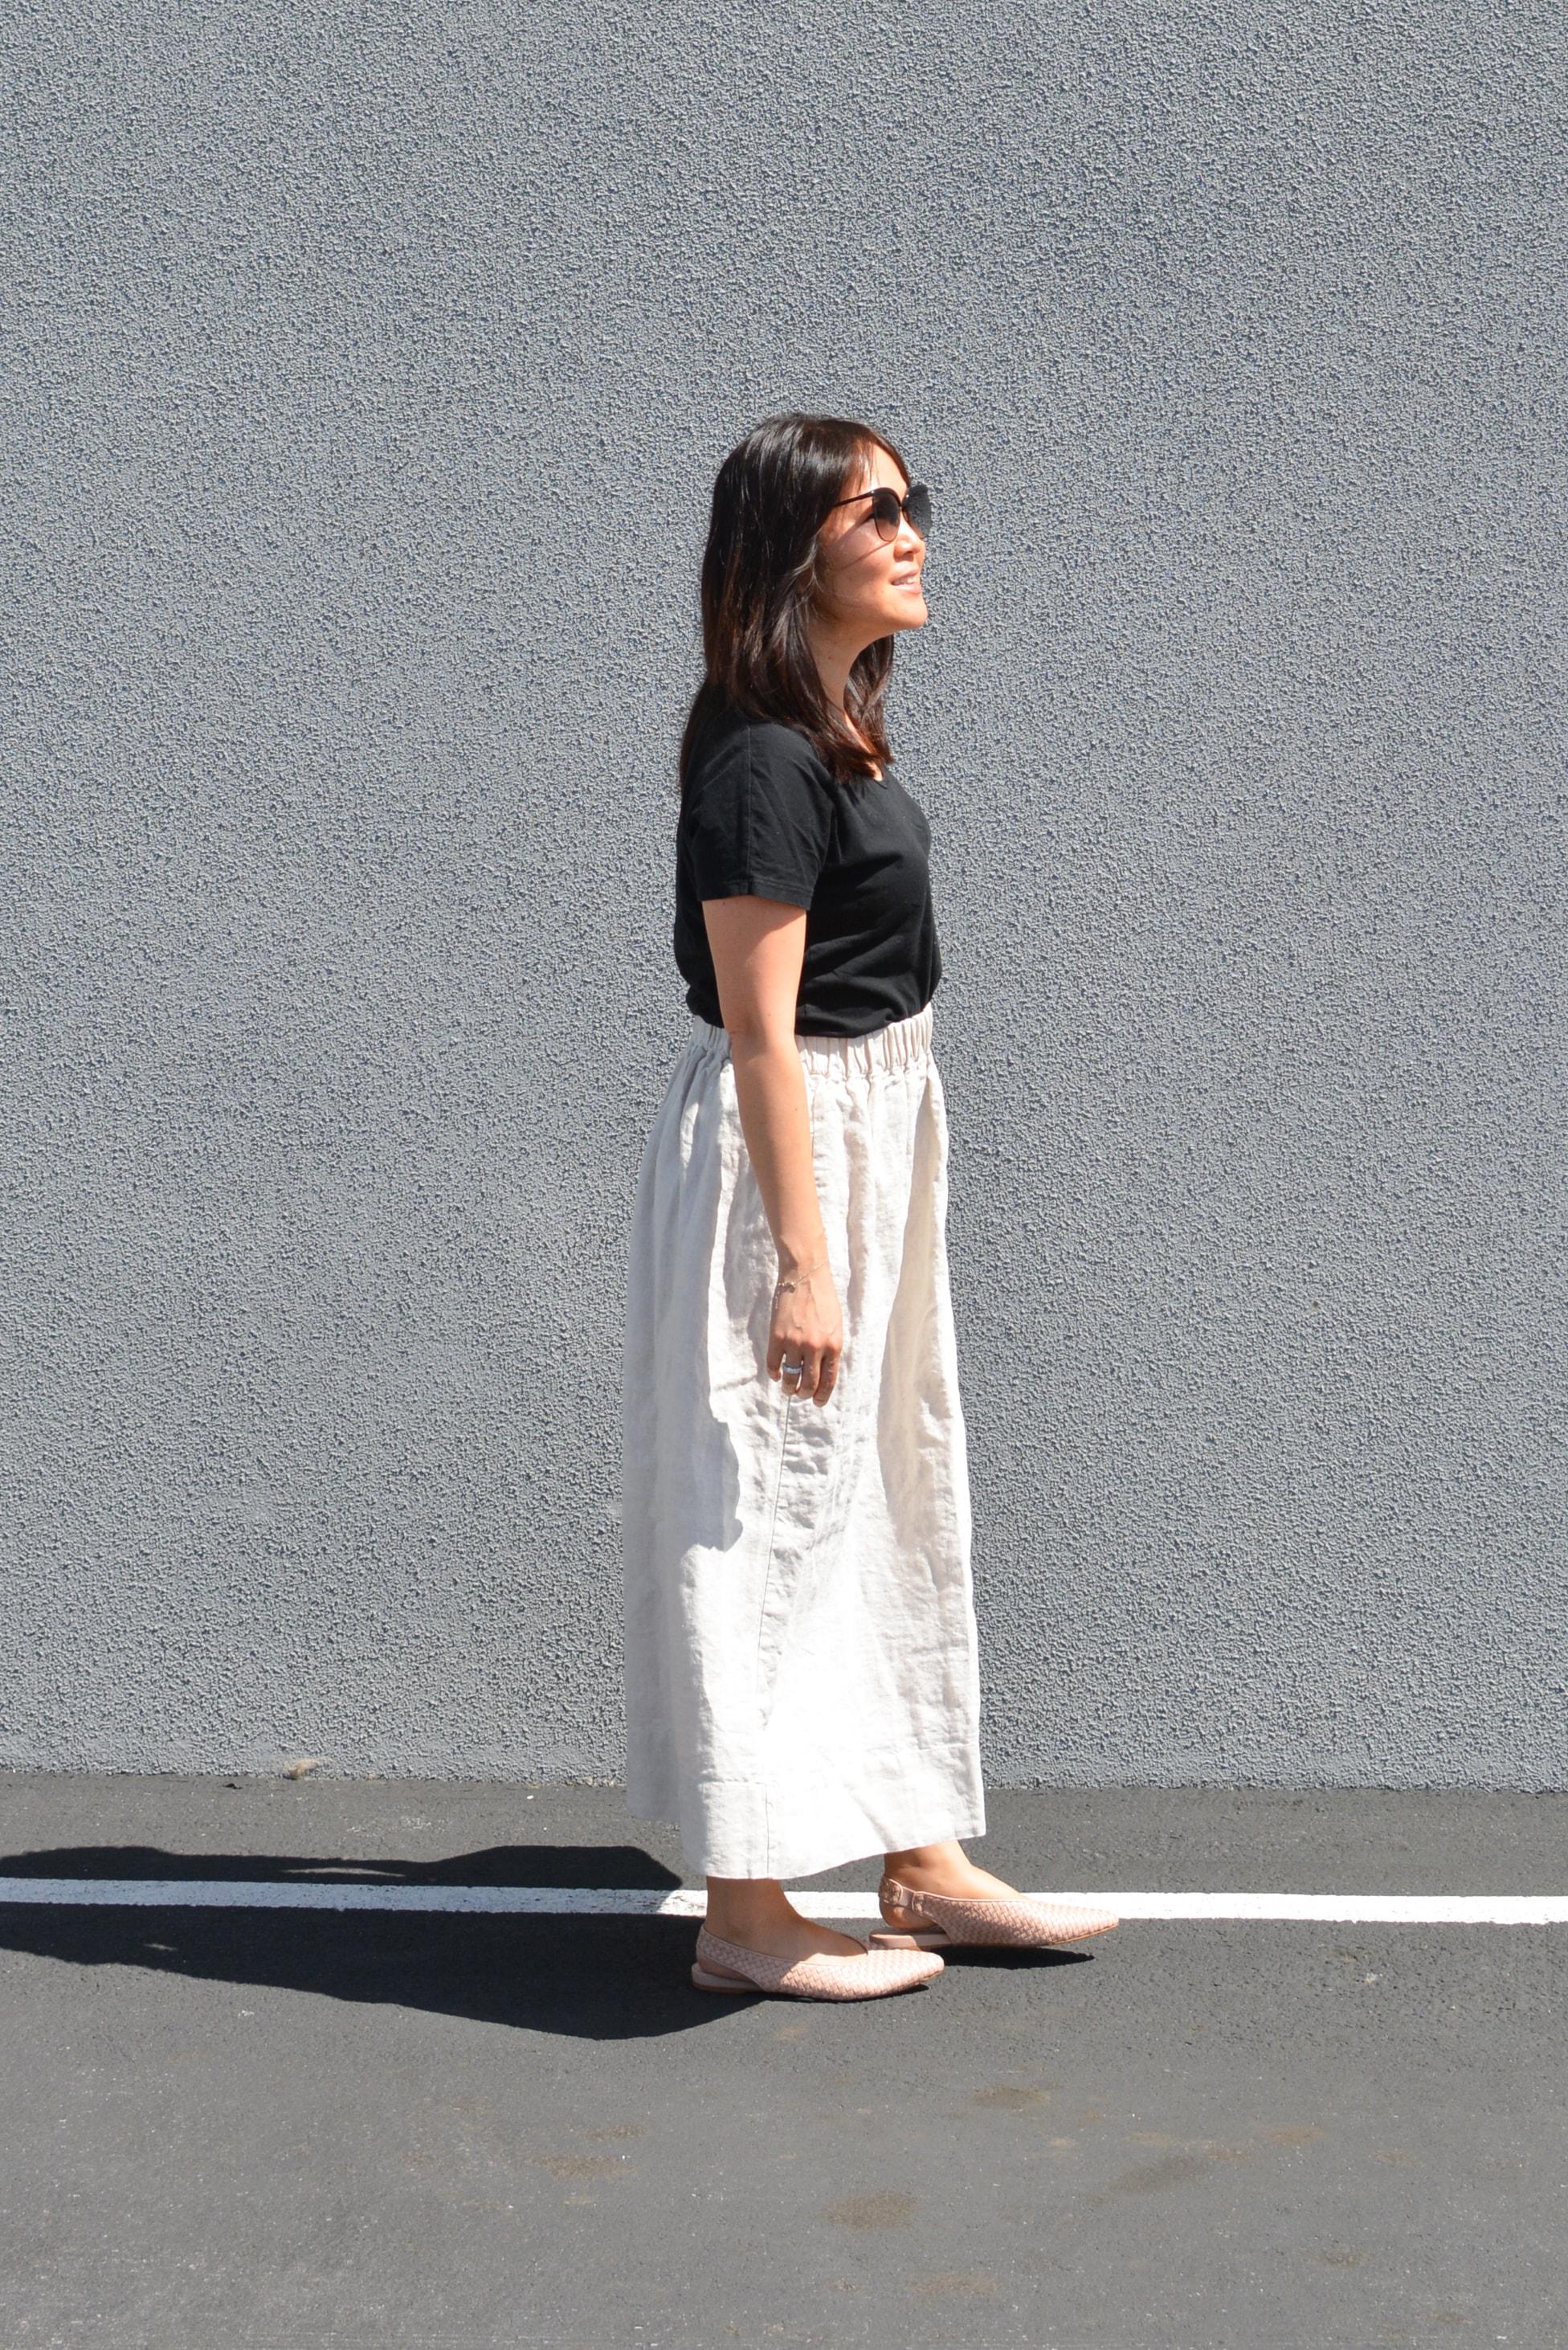 Elizabeth Suzann linen Bel skirt review (2 of 2)-min.jpg